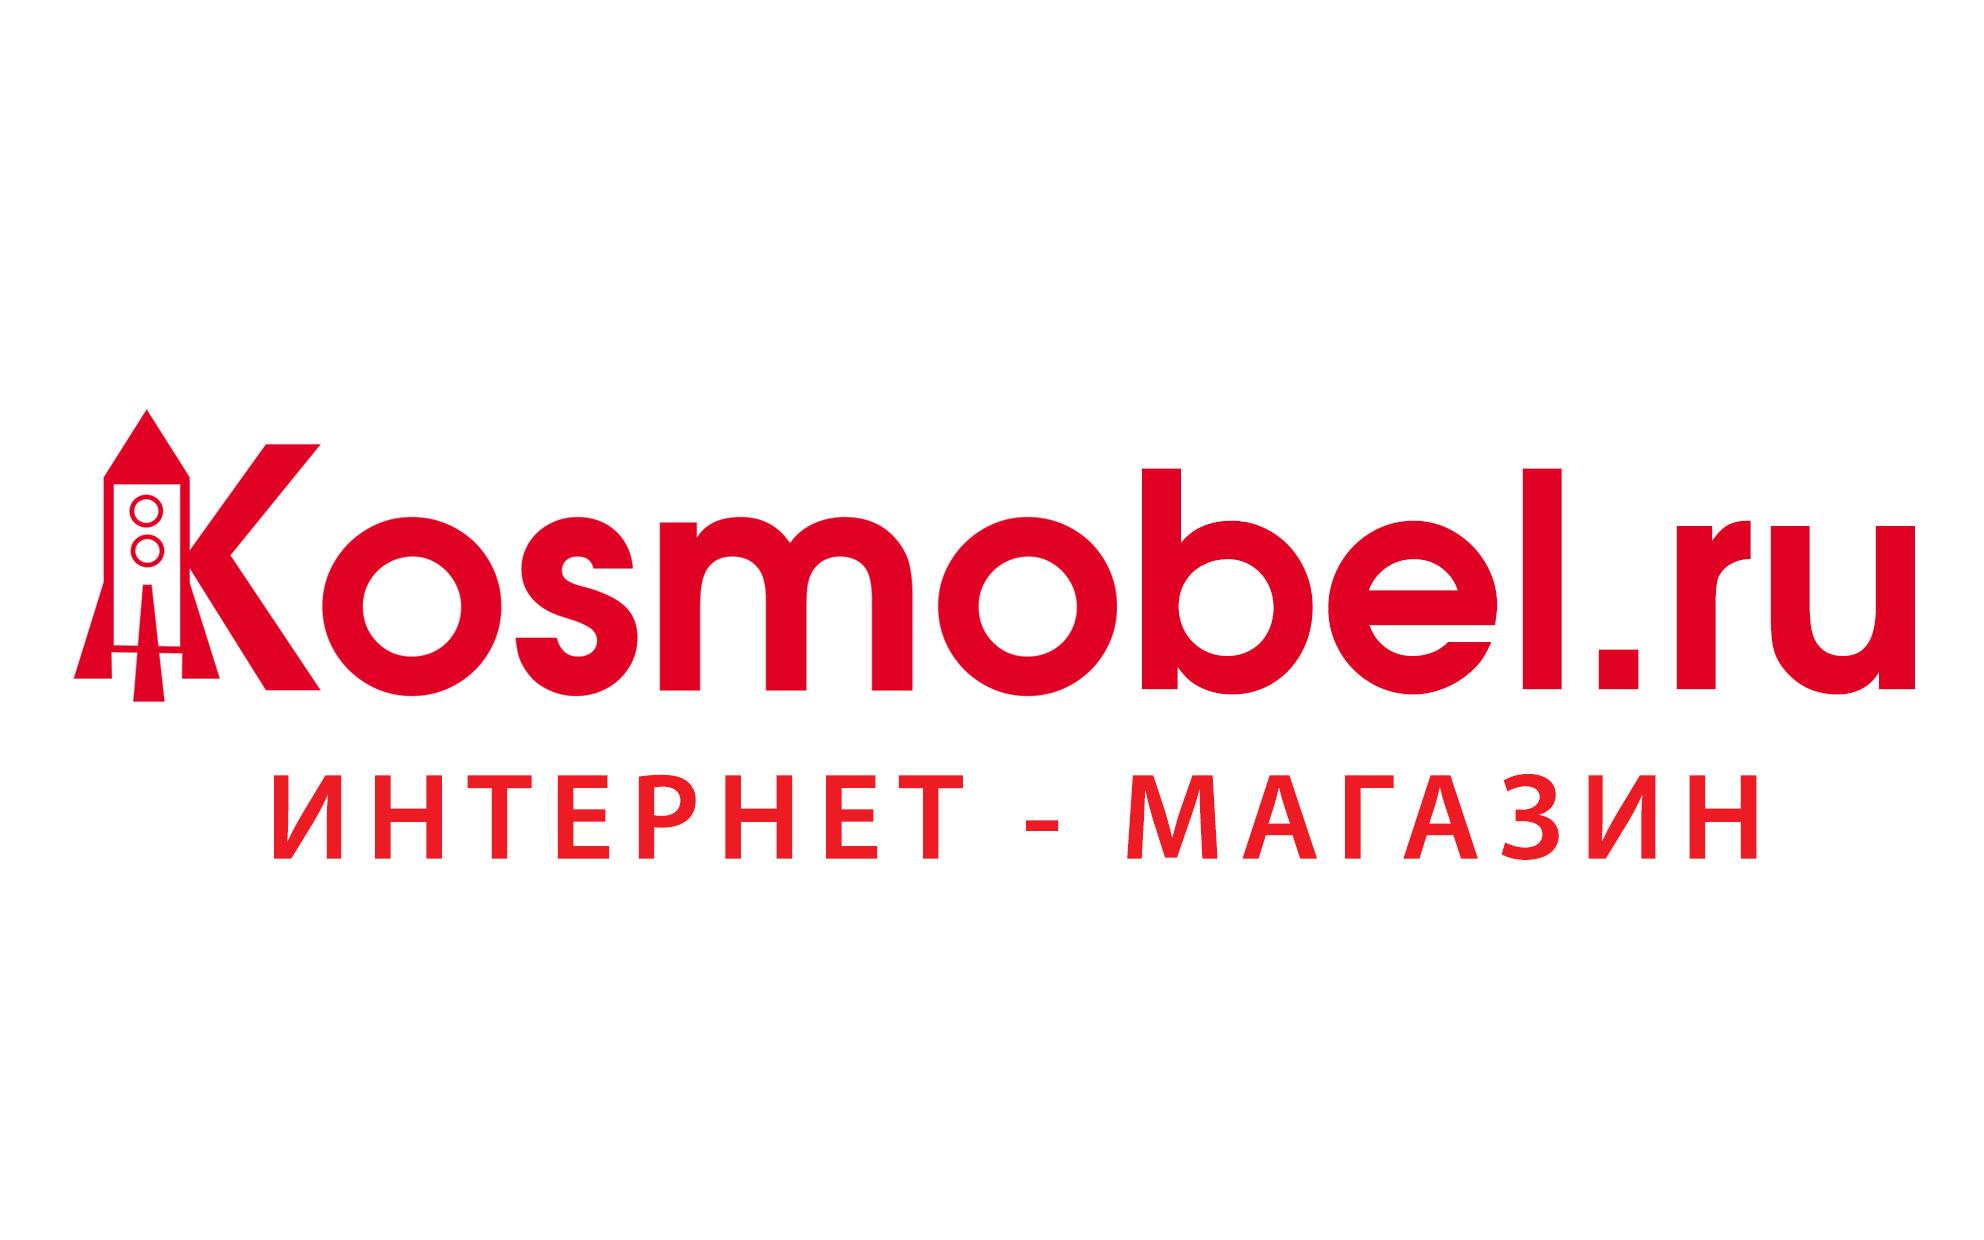 Kosmobel.ru